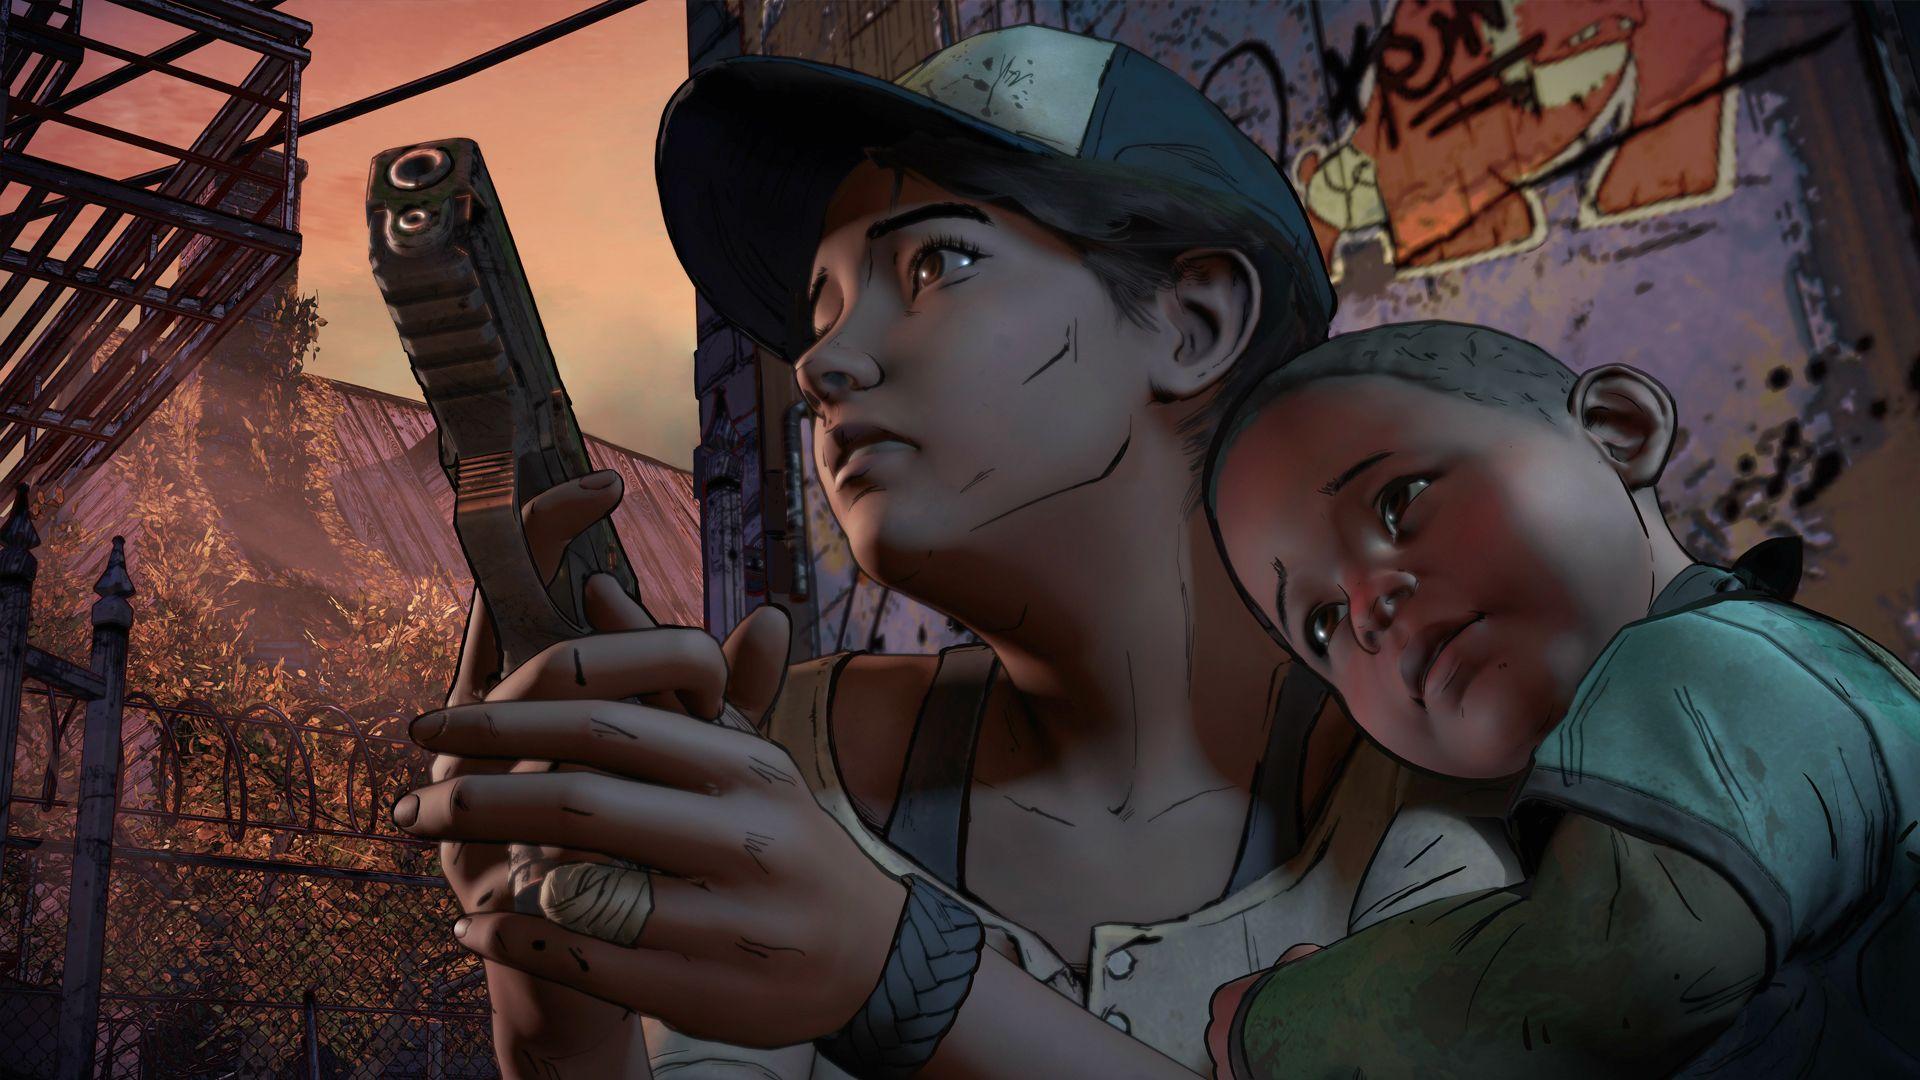 Telltale's The Walking Dead game officially restarts development following studio closure